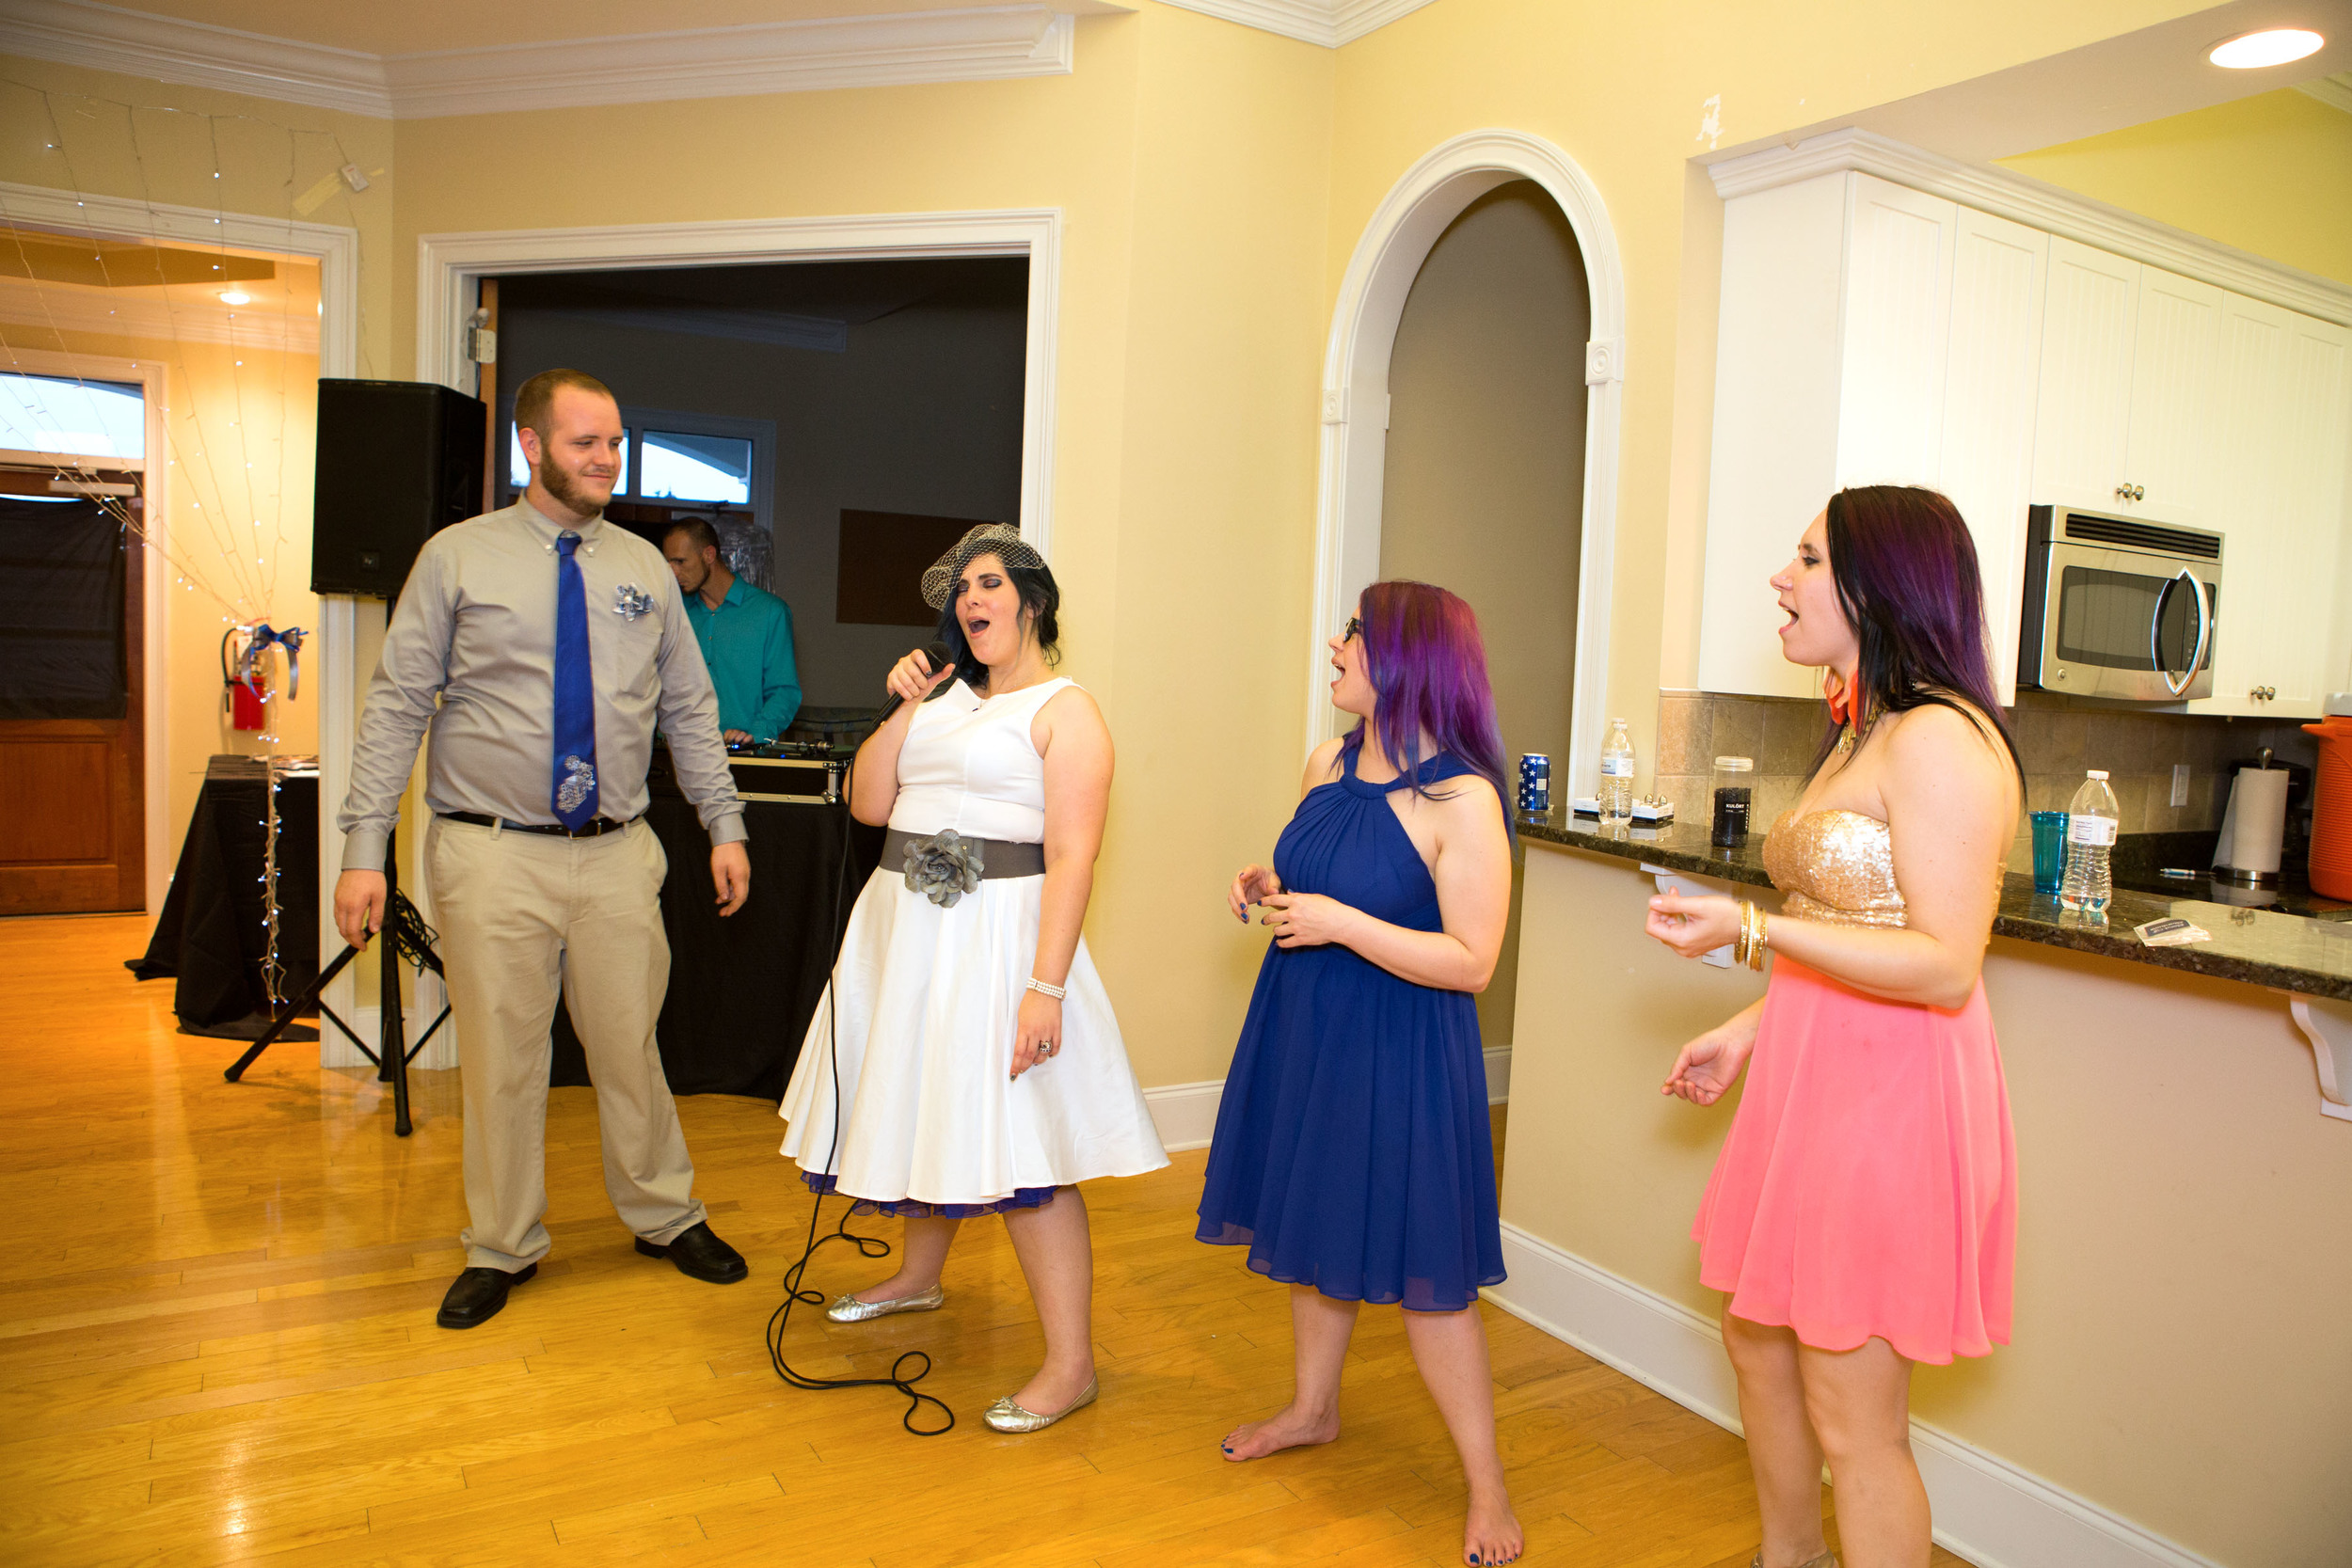 Leland_Wedding_Photographer_Tiffany_Abruzzo_Reception_167.jpg